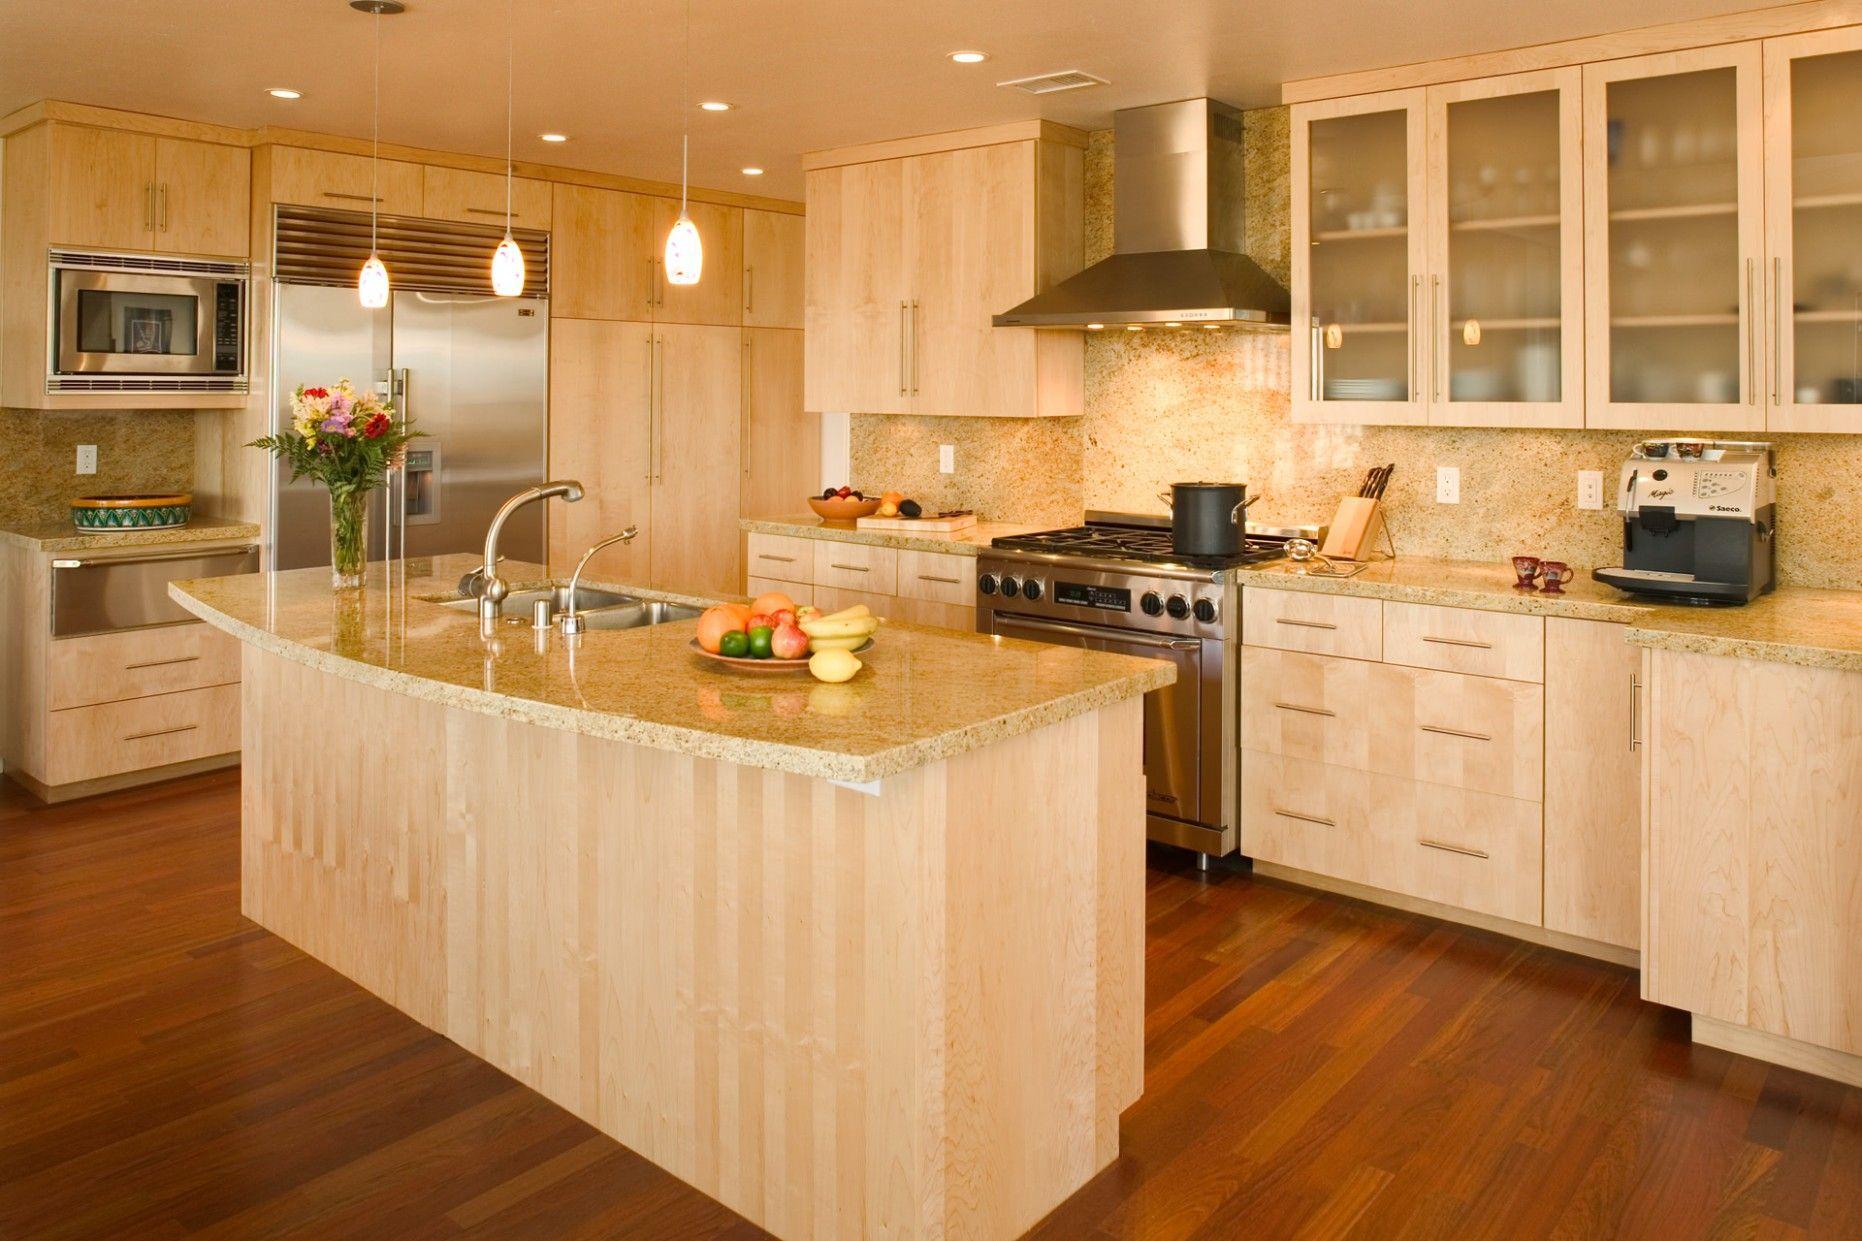 custom contemporary kitchen cabinets alder wood java finish shaker maple kitchen cabinets on kitchen cabinets java id=33885